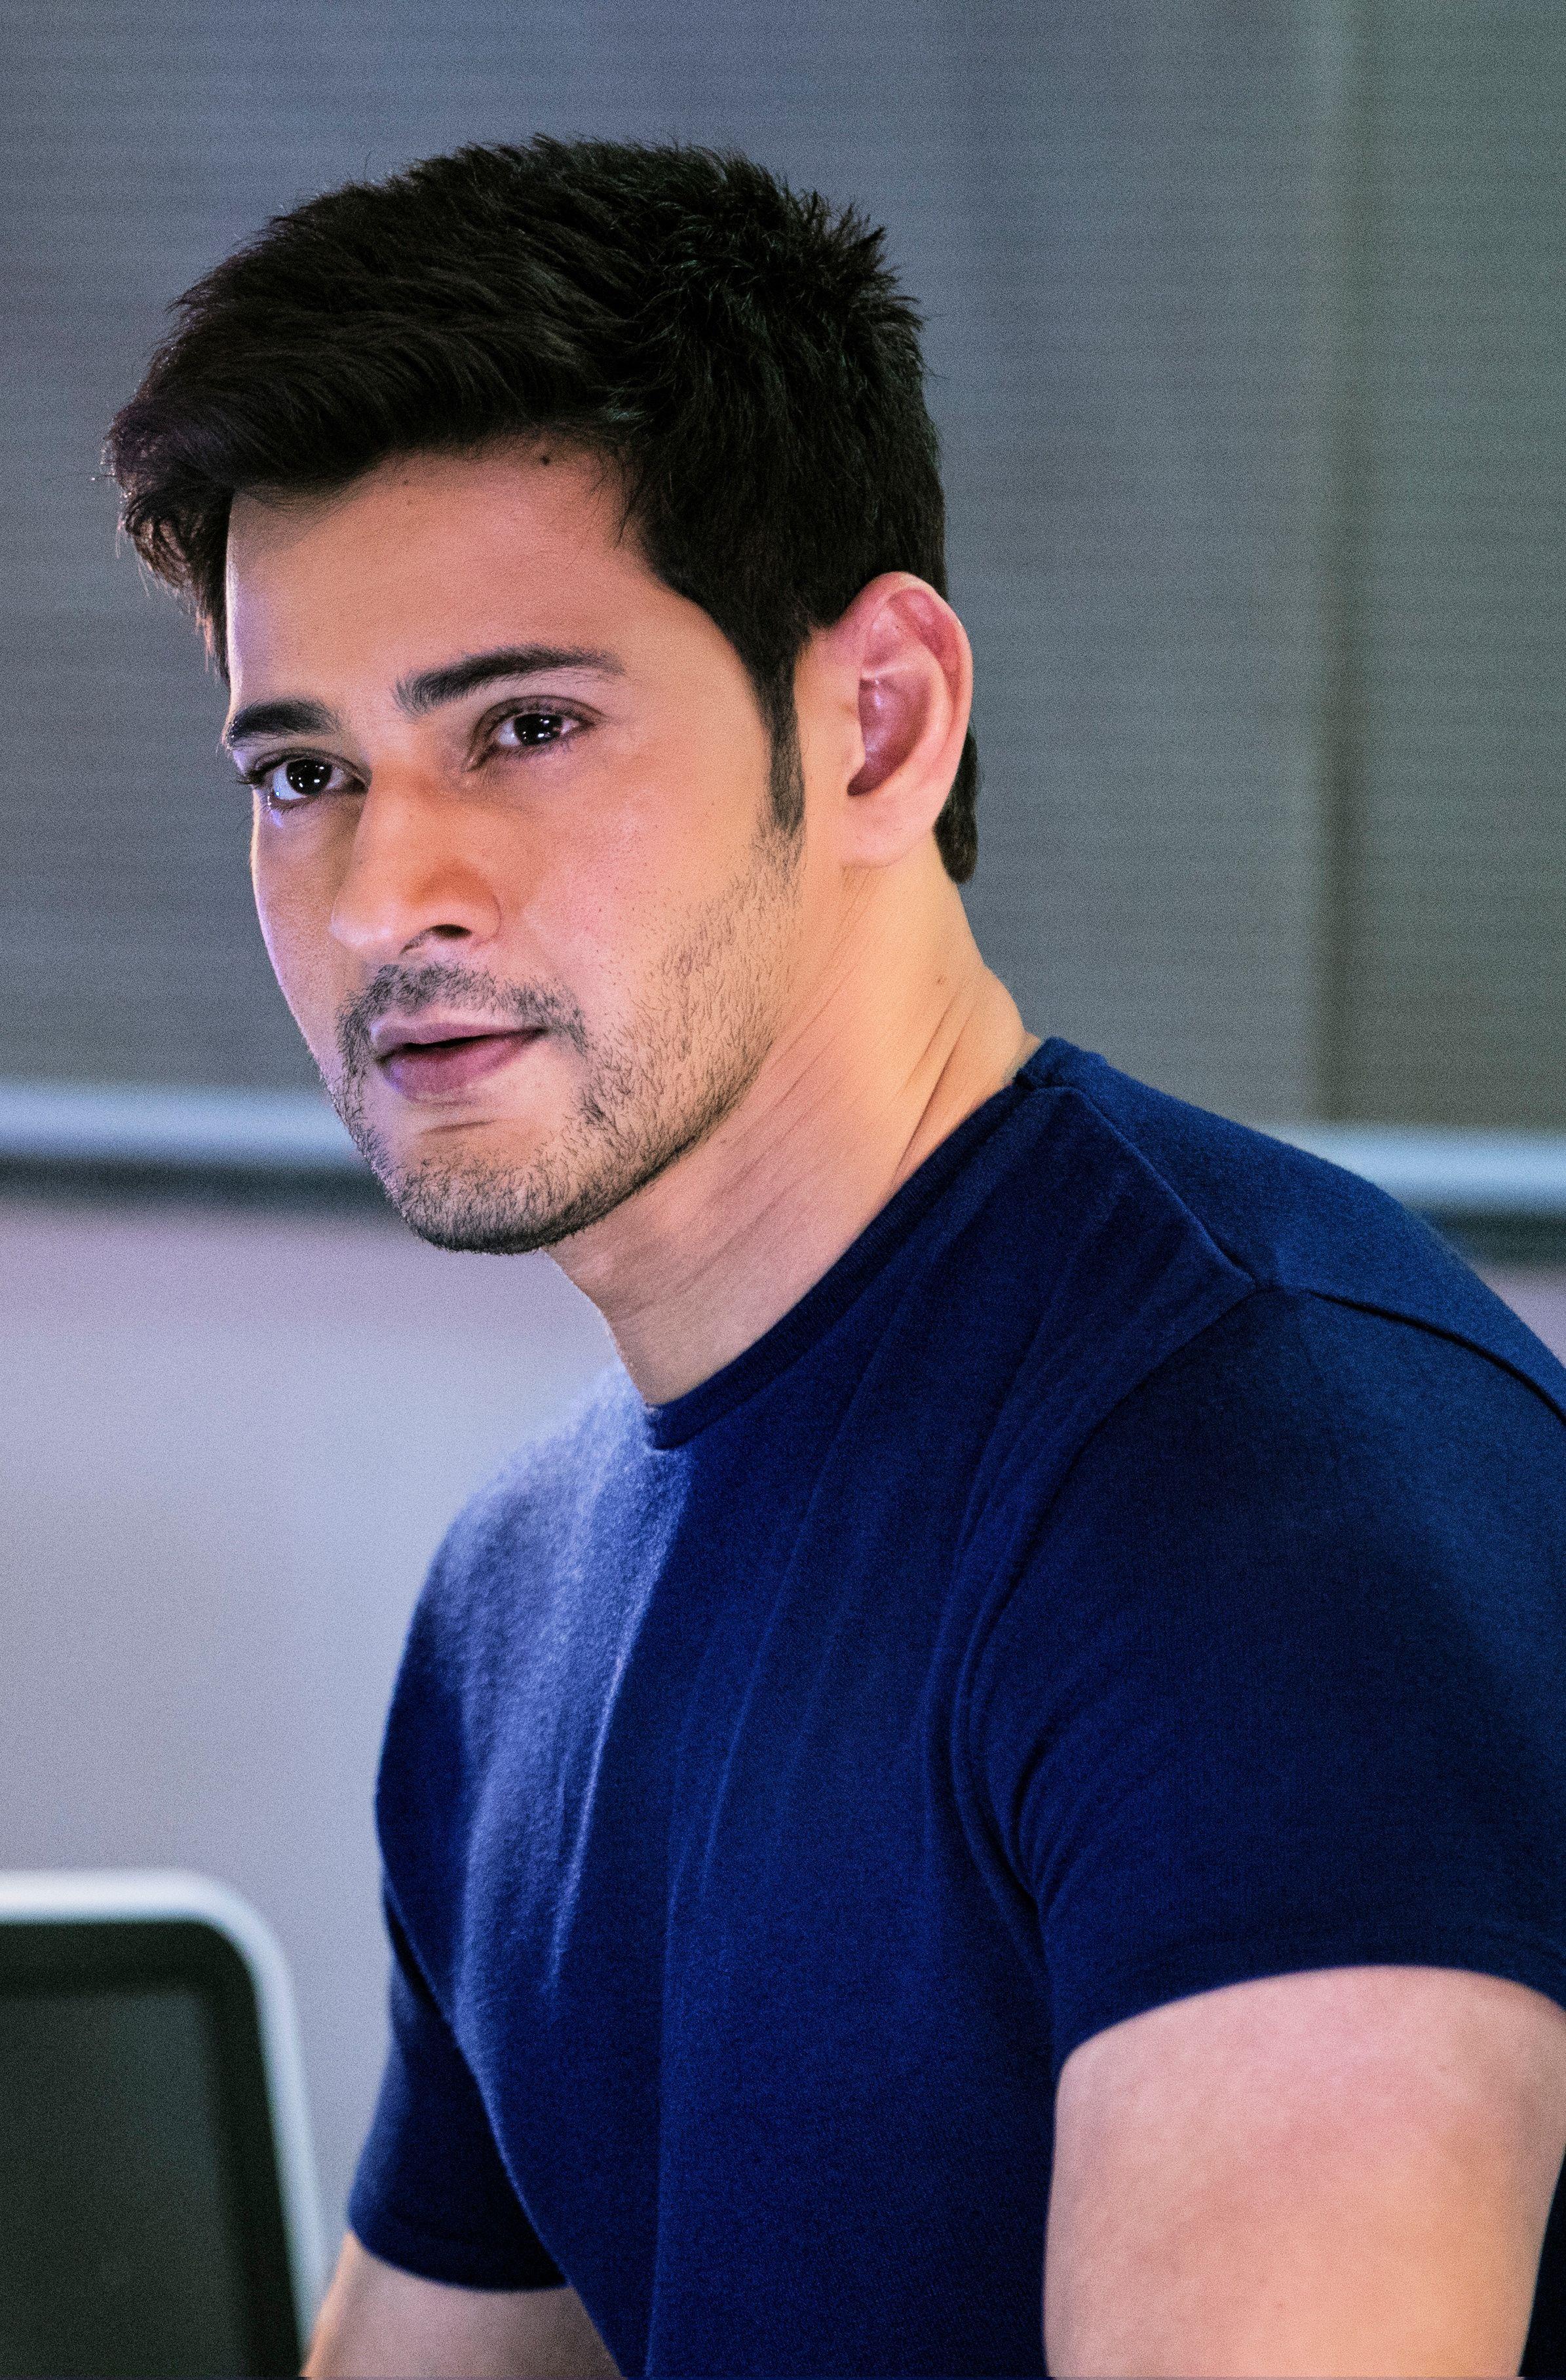 Mahesh Babu S Still From The Movie Spyder Celebrities In